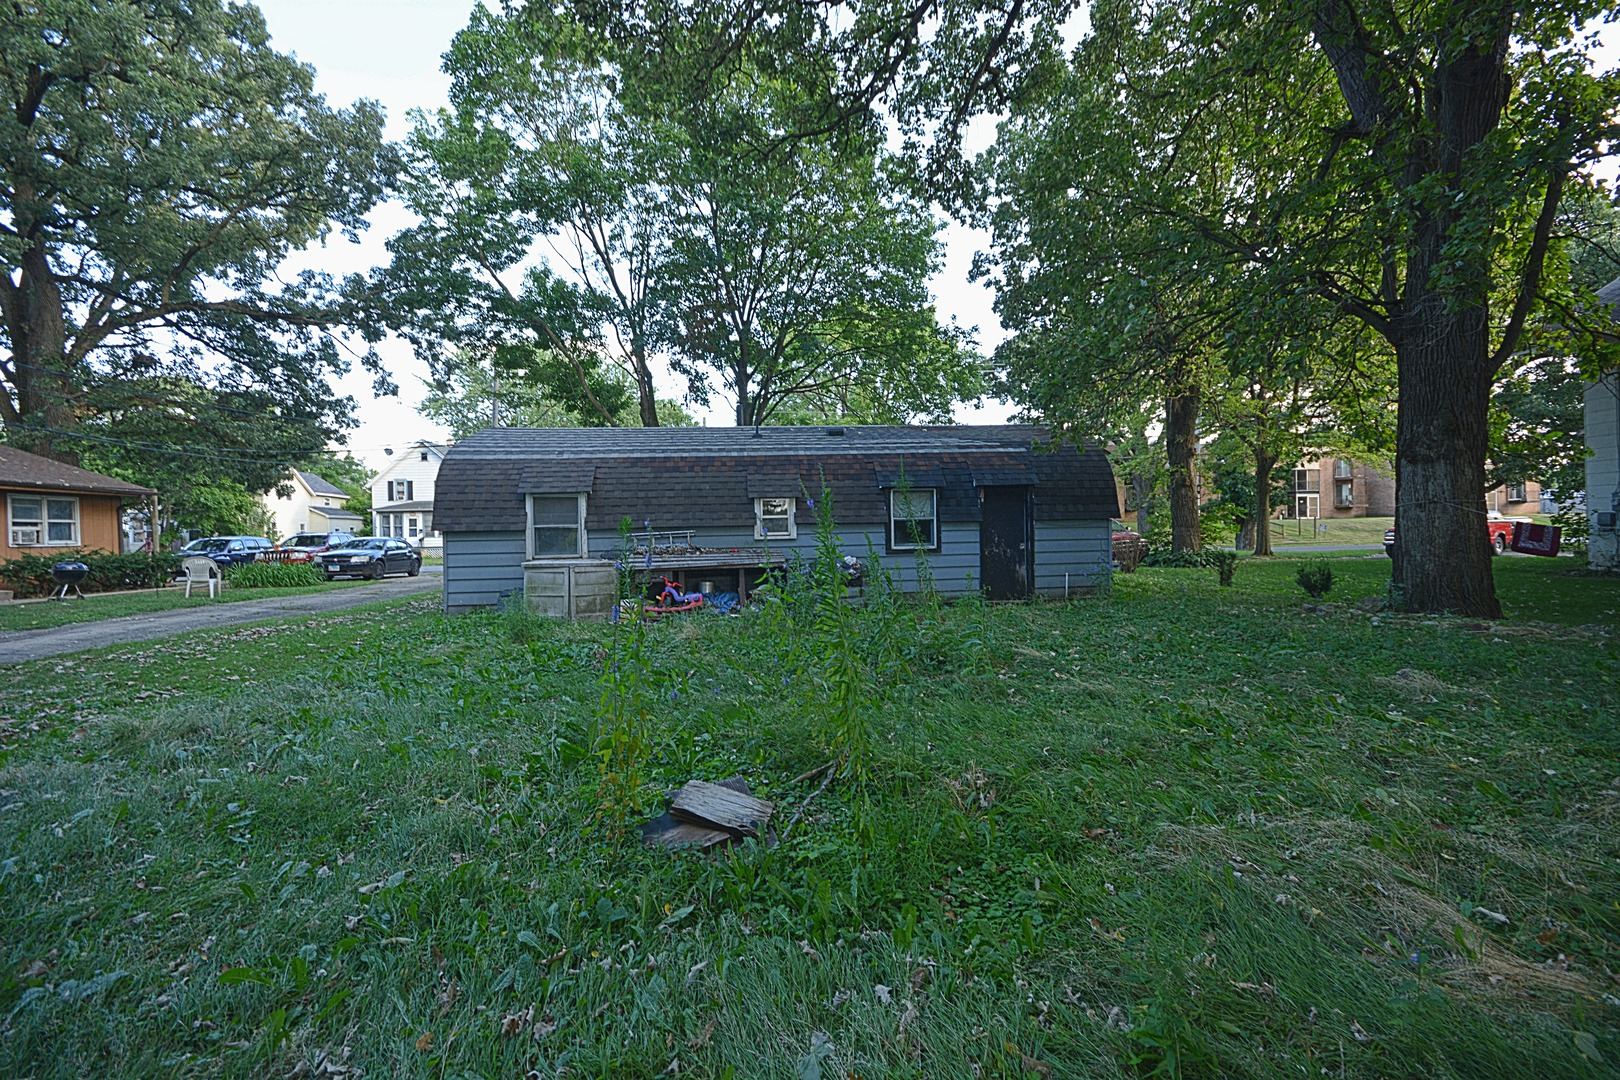 619 West Locust, Belvidere, Illinois, 61008